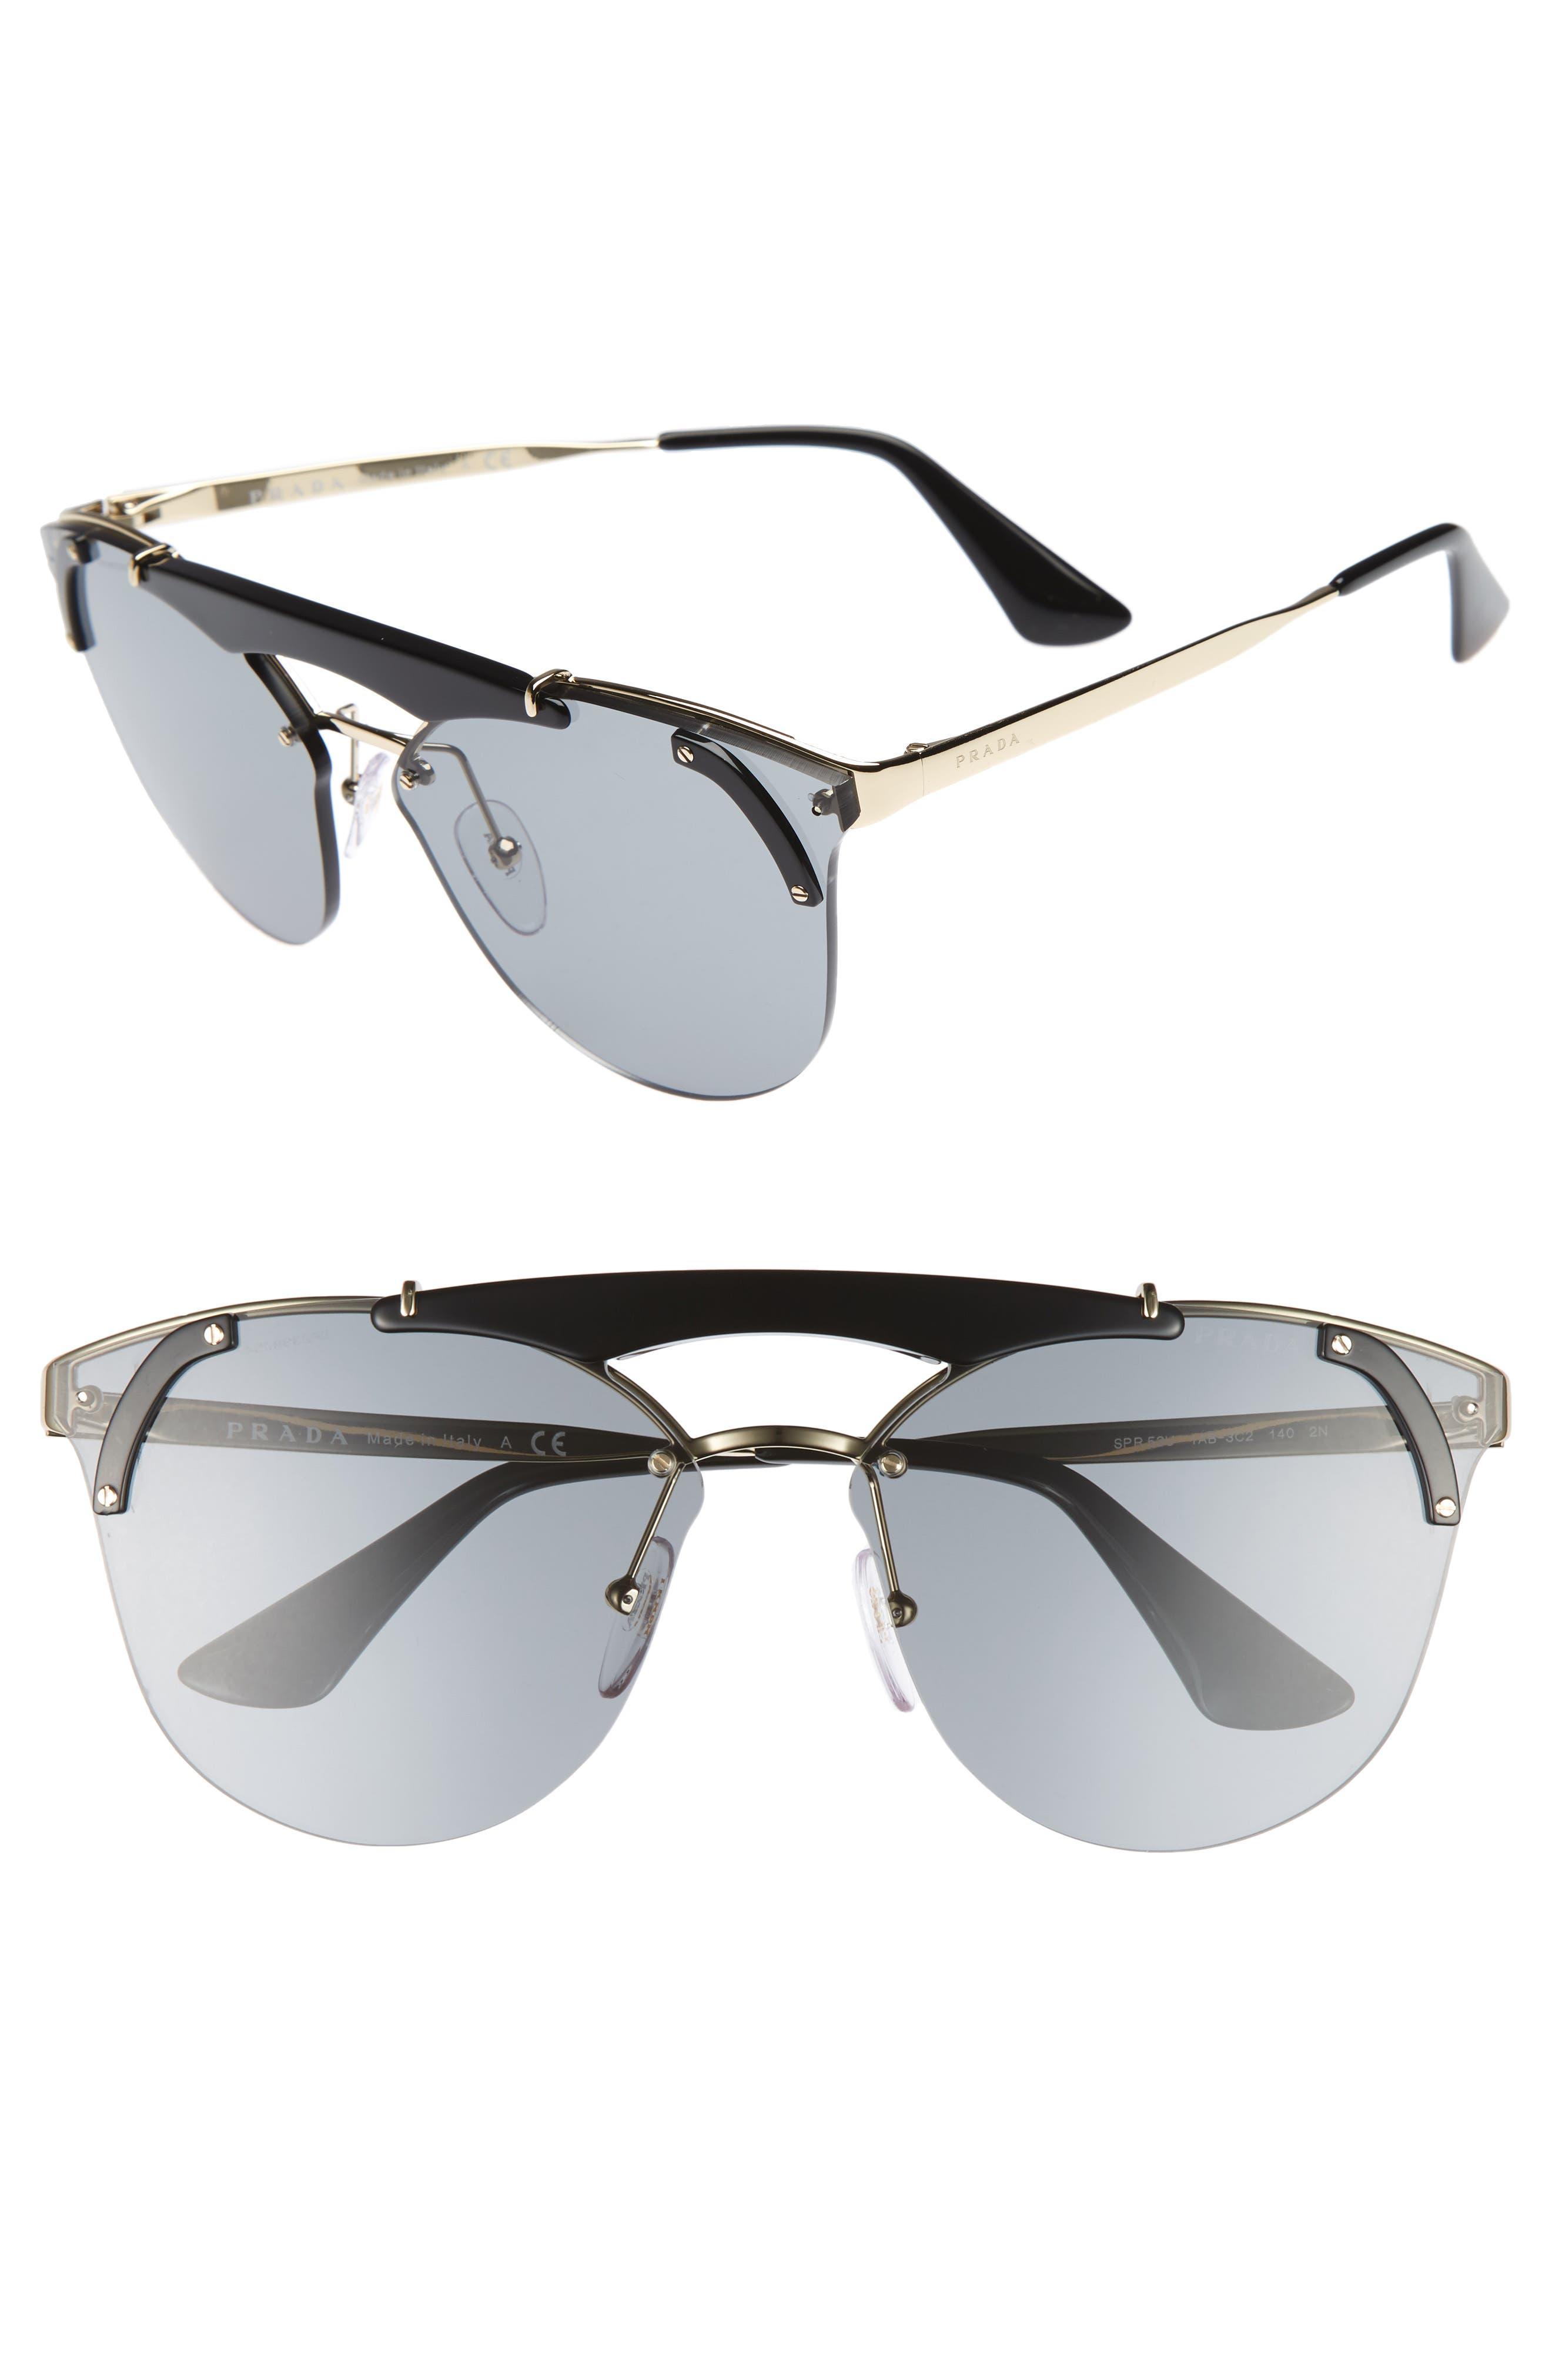 Alternate Image 1 Selected - Prada 53mm Round Sunglasses